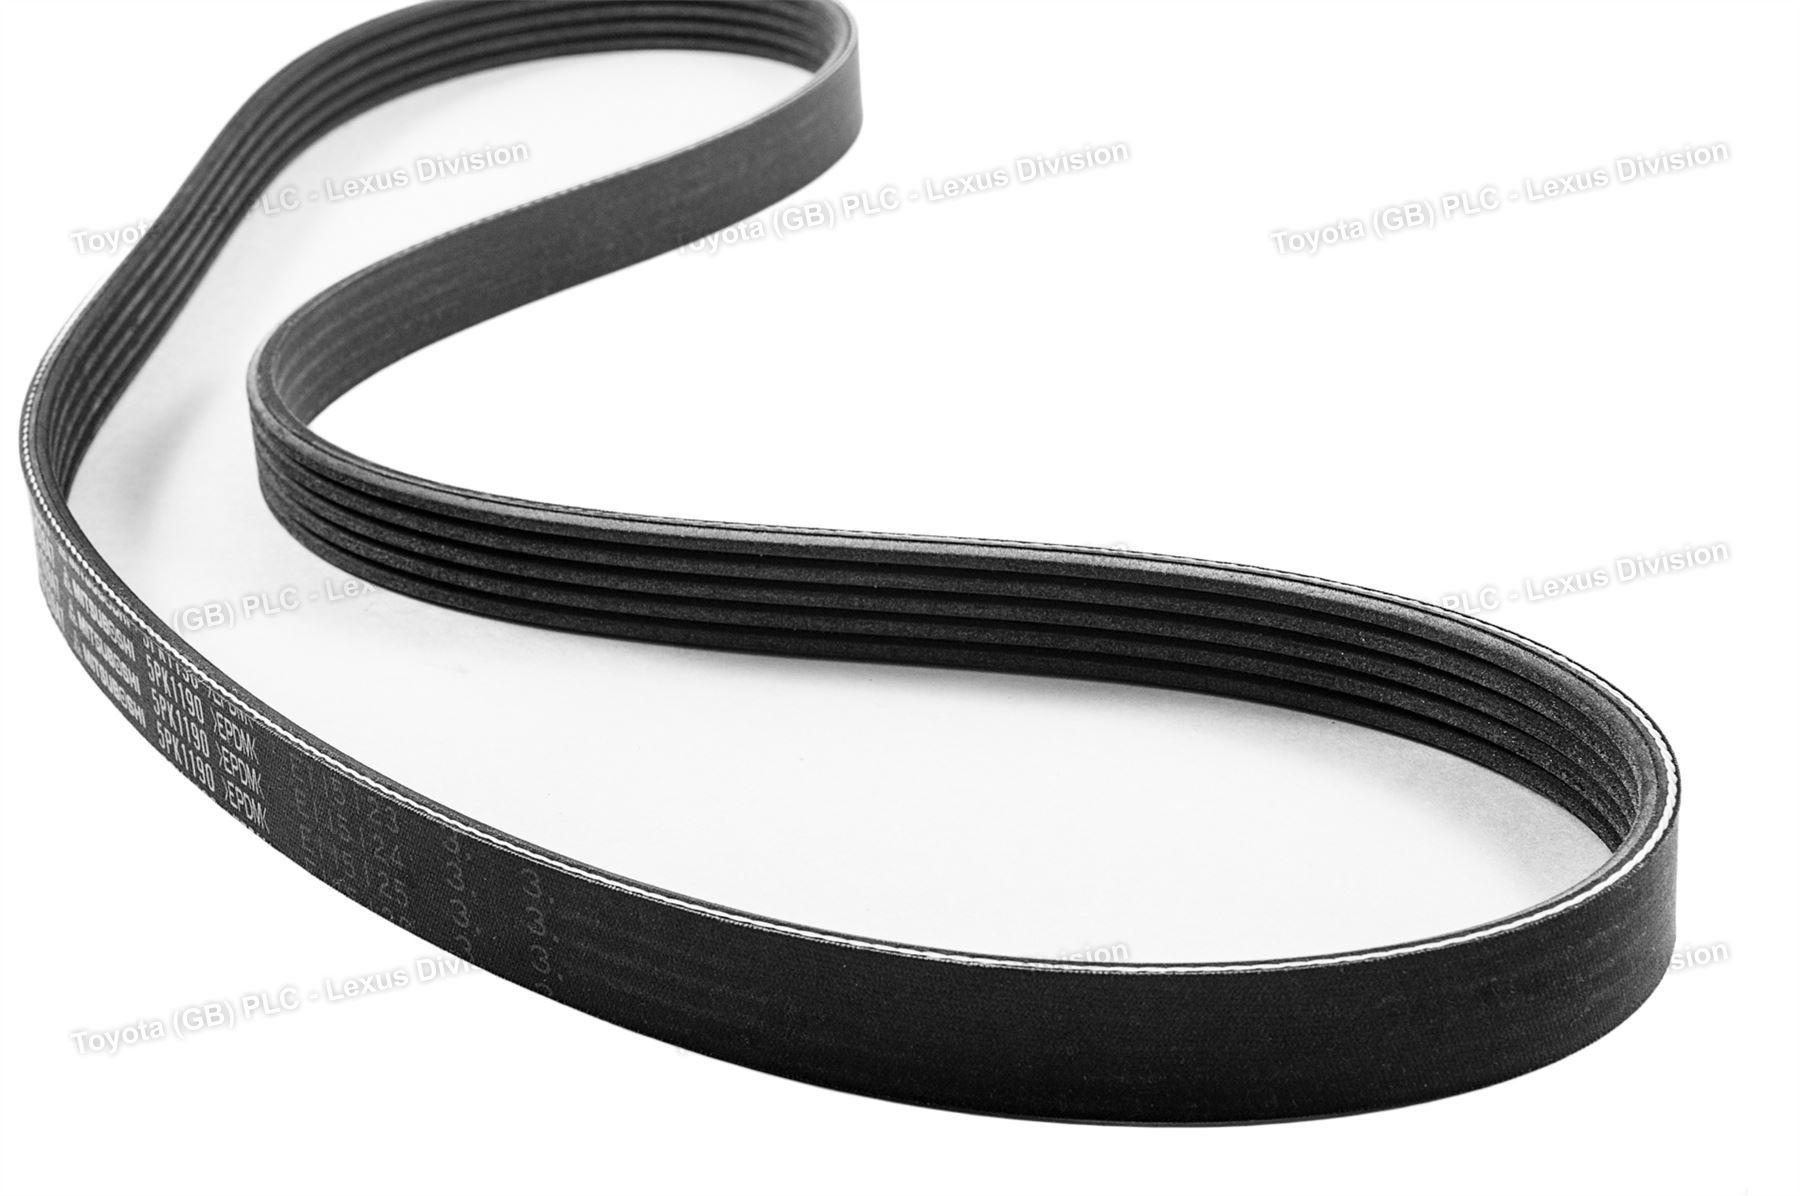 genuine toyota rav4 v belt serpentine belt and alternator